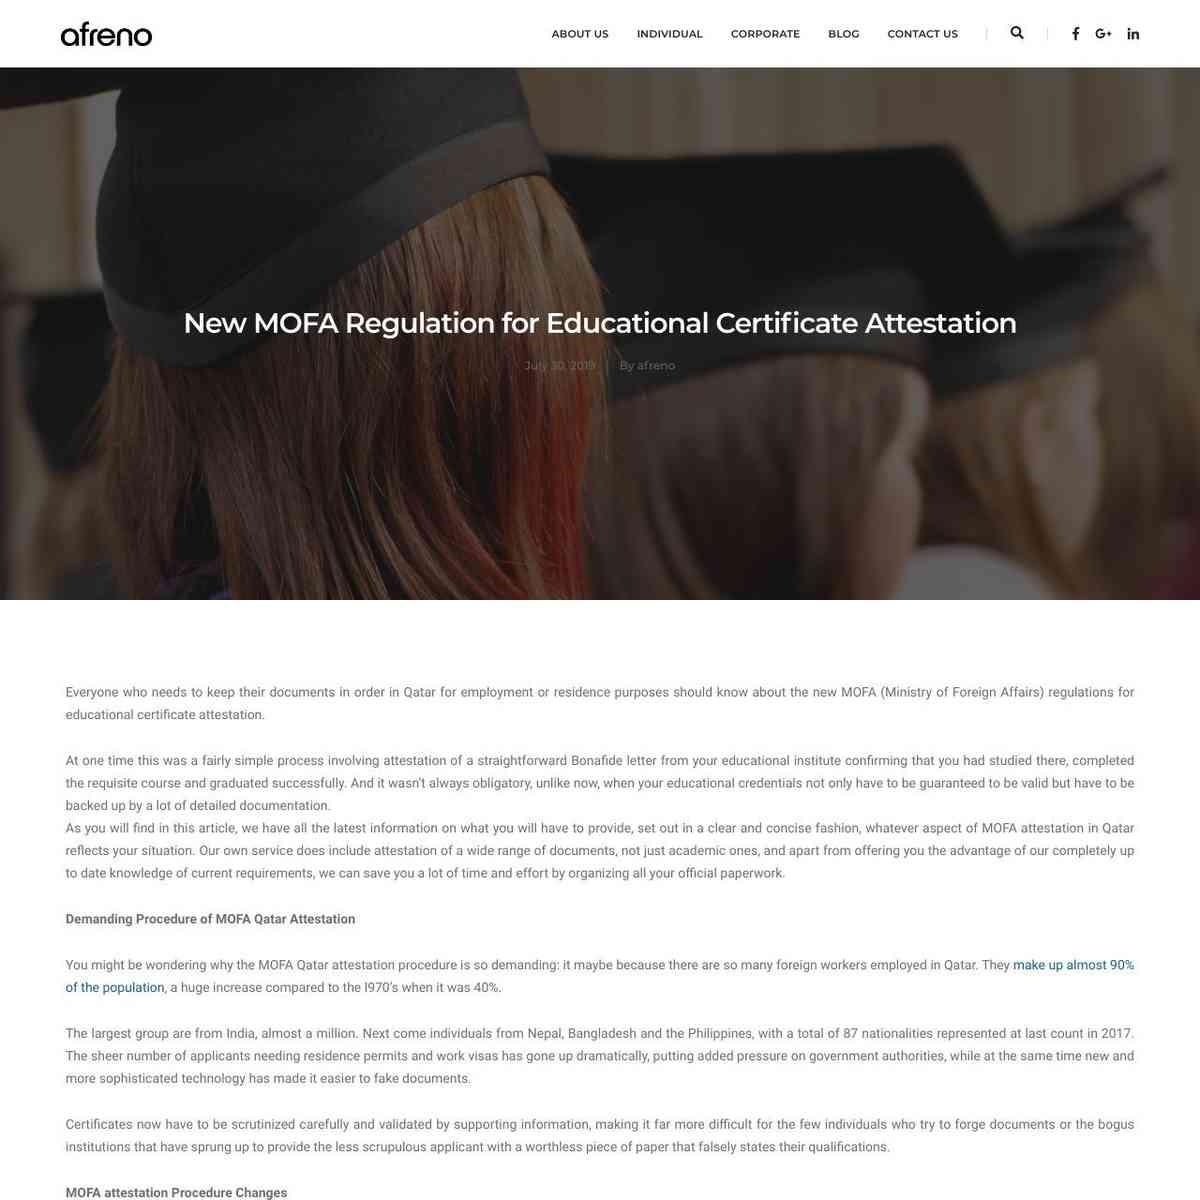 New MOFA Regulation for Educational Certificate Attestation